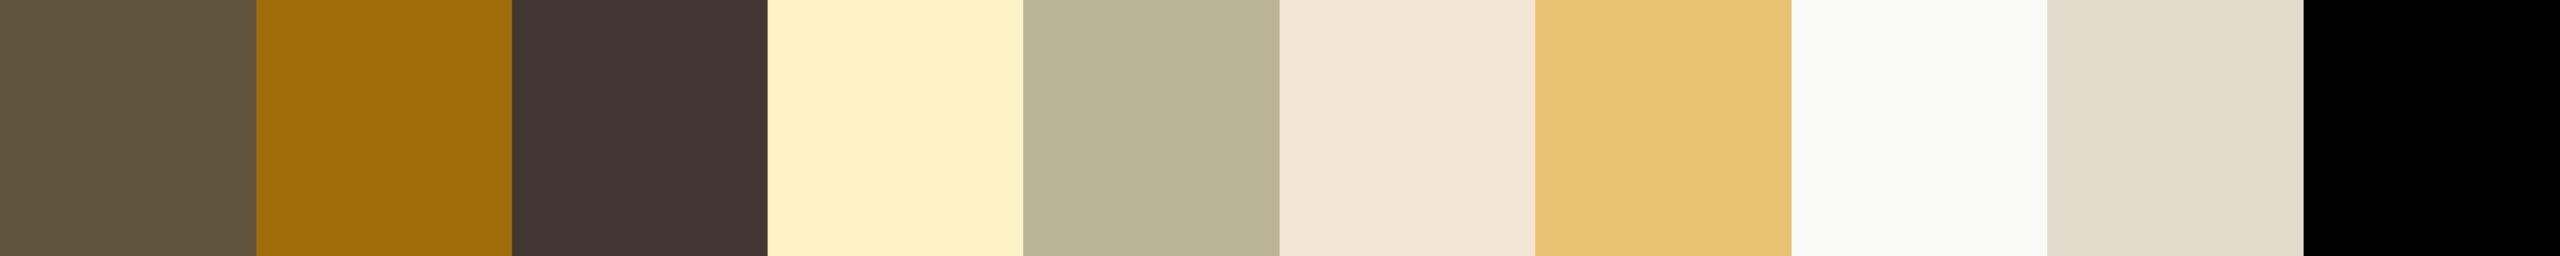 270 Tedialava Color Palette